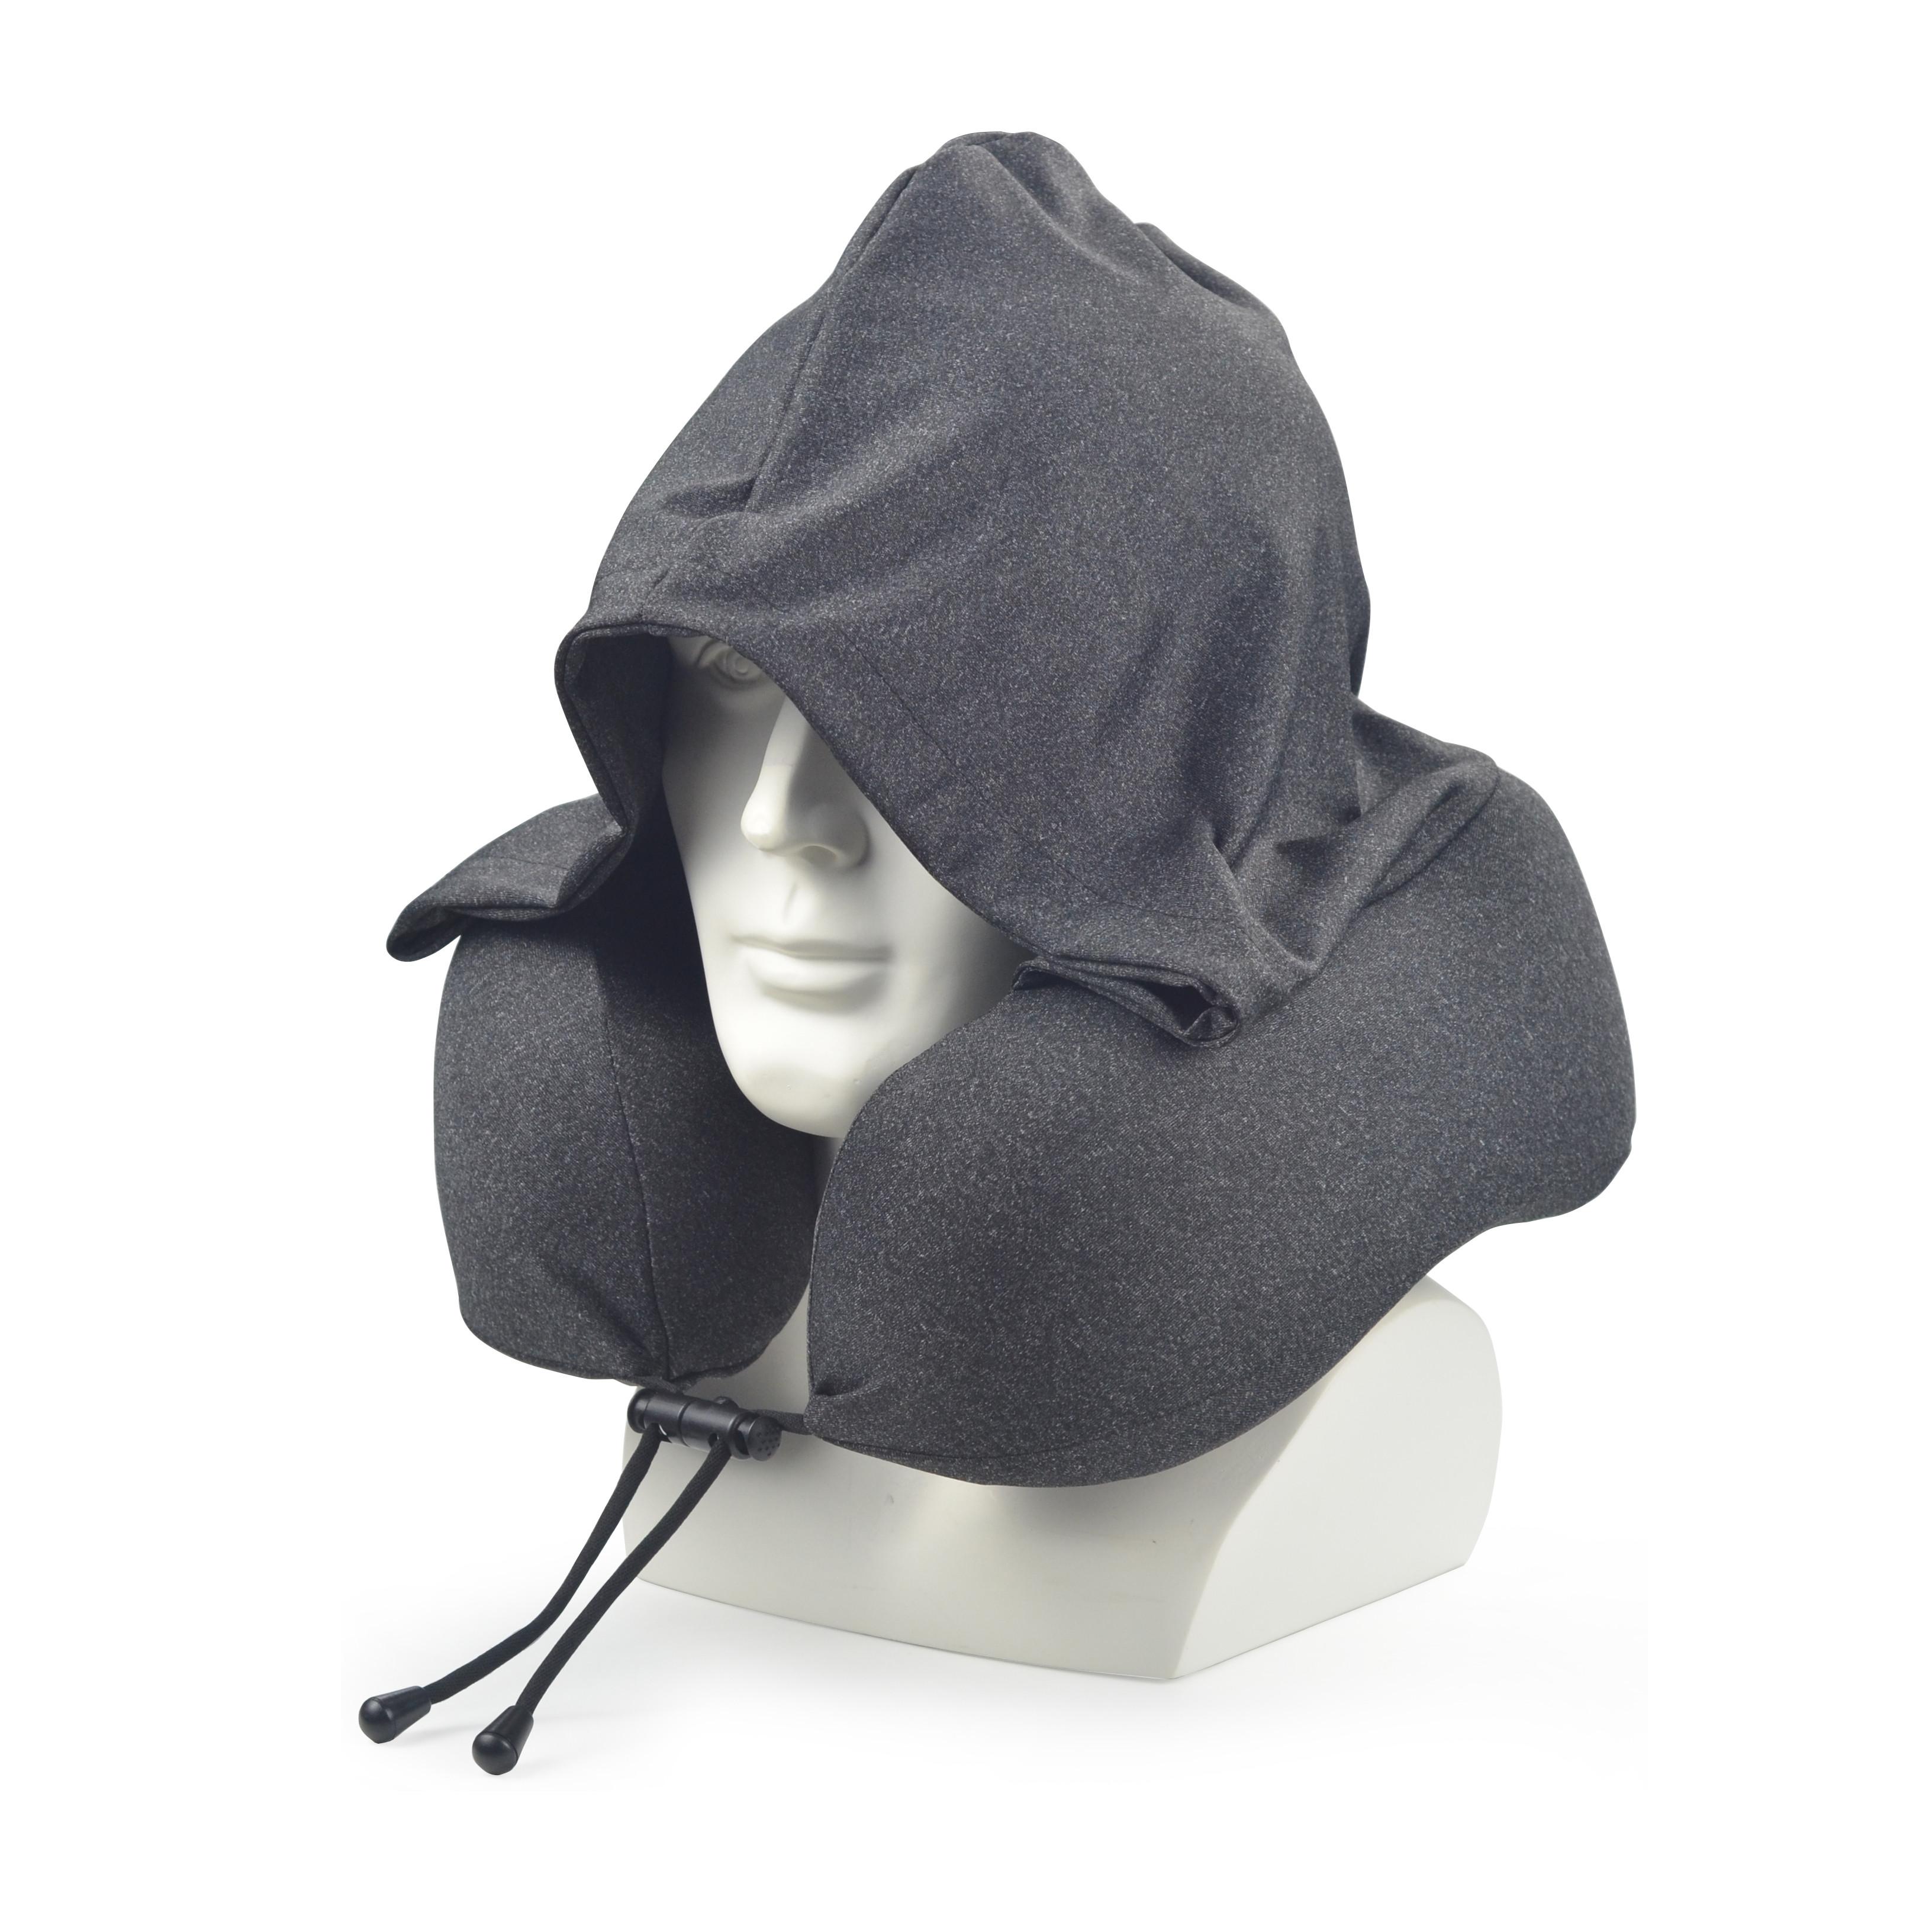 Black hoodie custom travel pillow hooded memory foam neck pillow